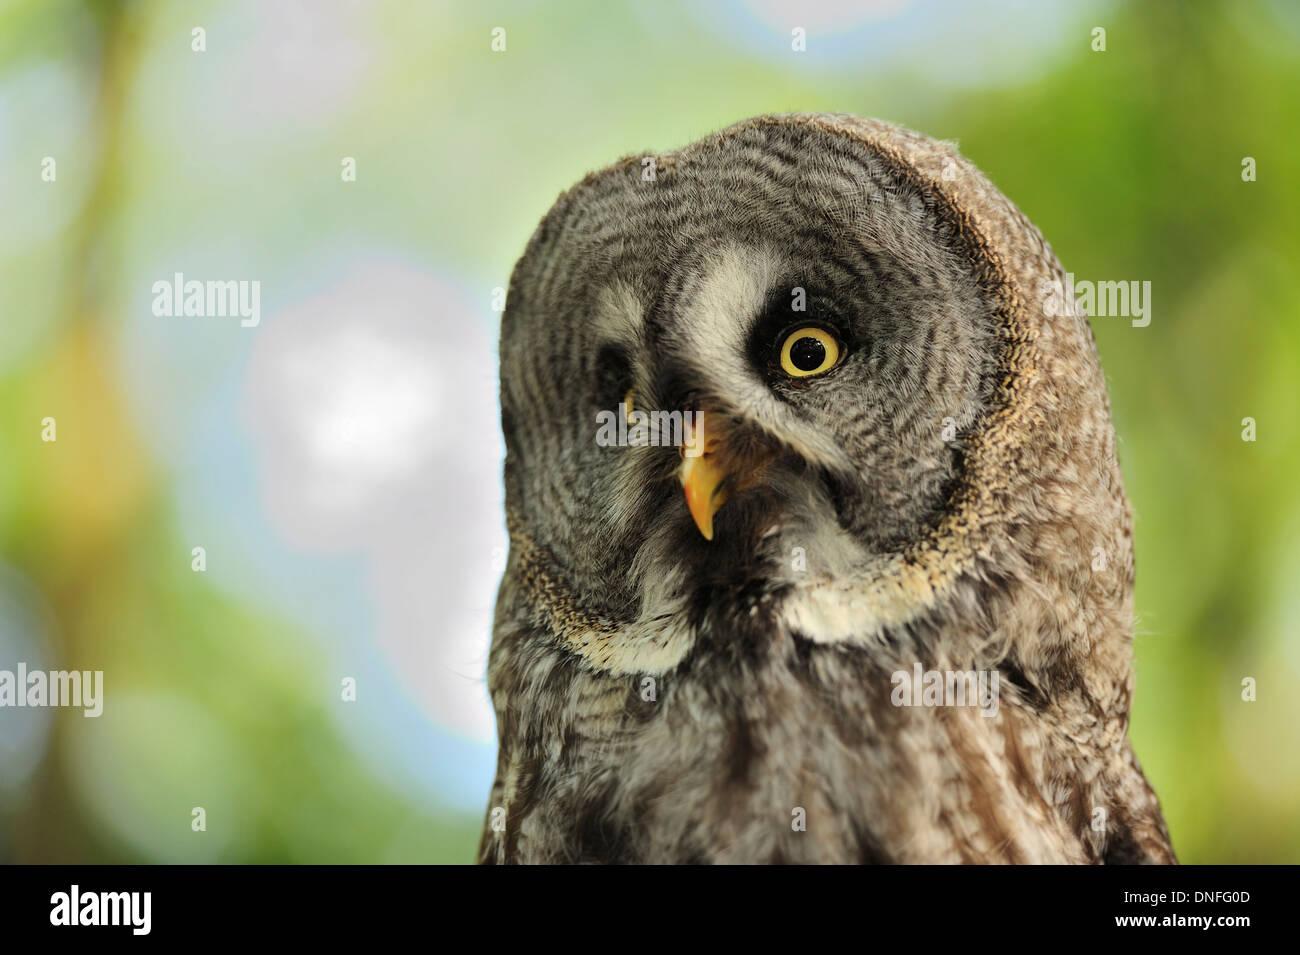 Great Grey Owl, Strix nebulosa, Strigidae - Stock Image